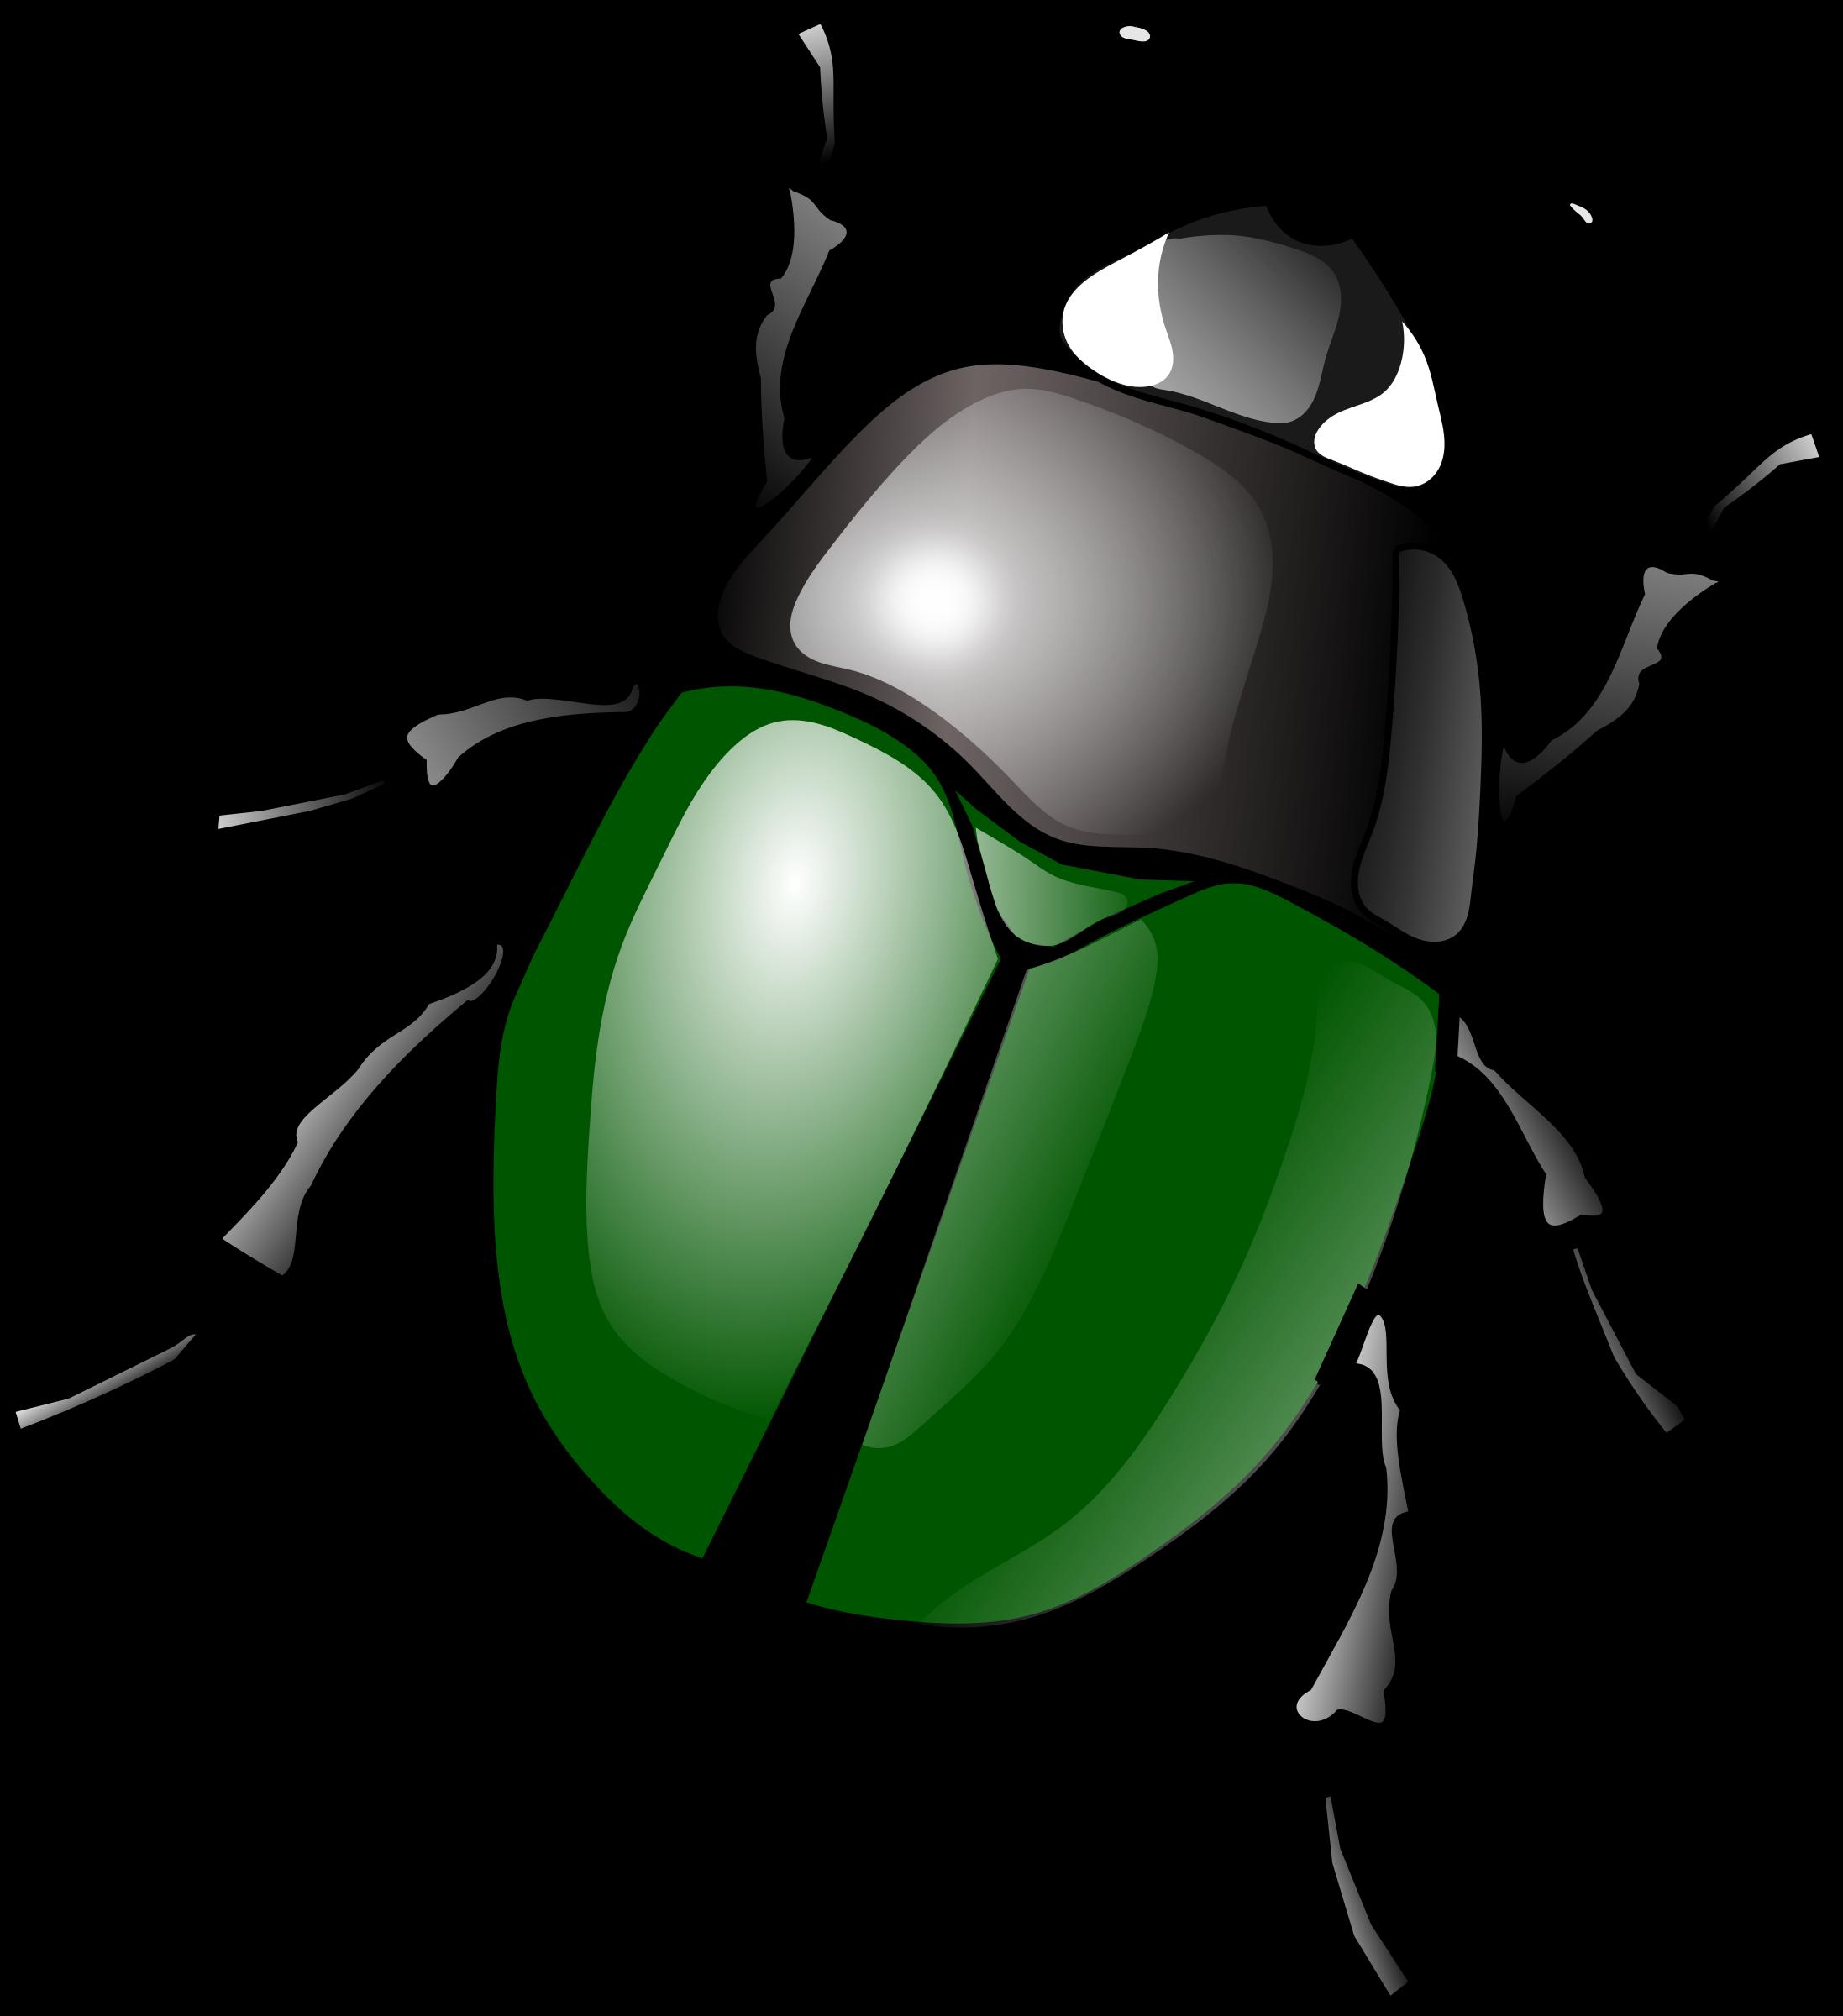 Download Png Image Bug Png Image